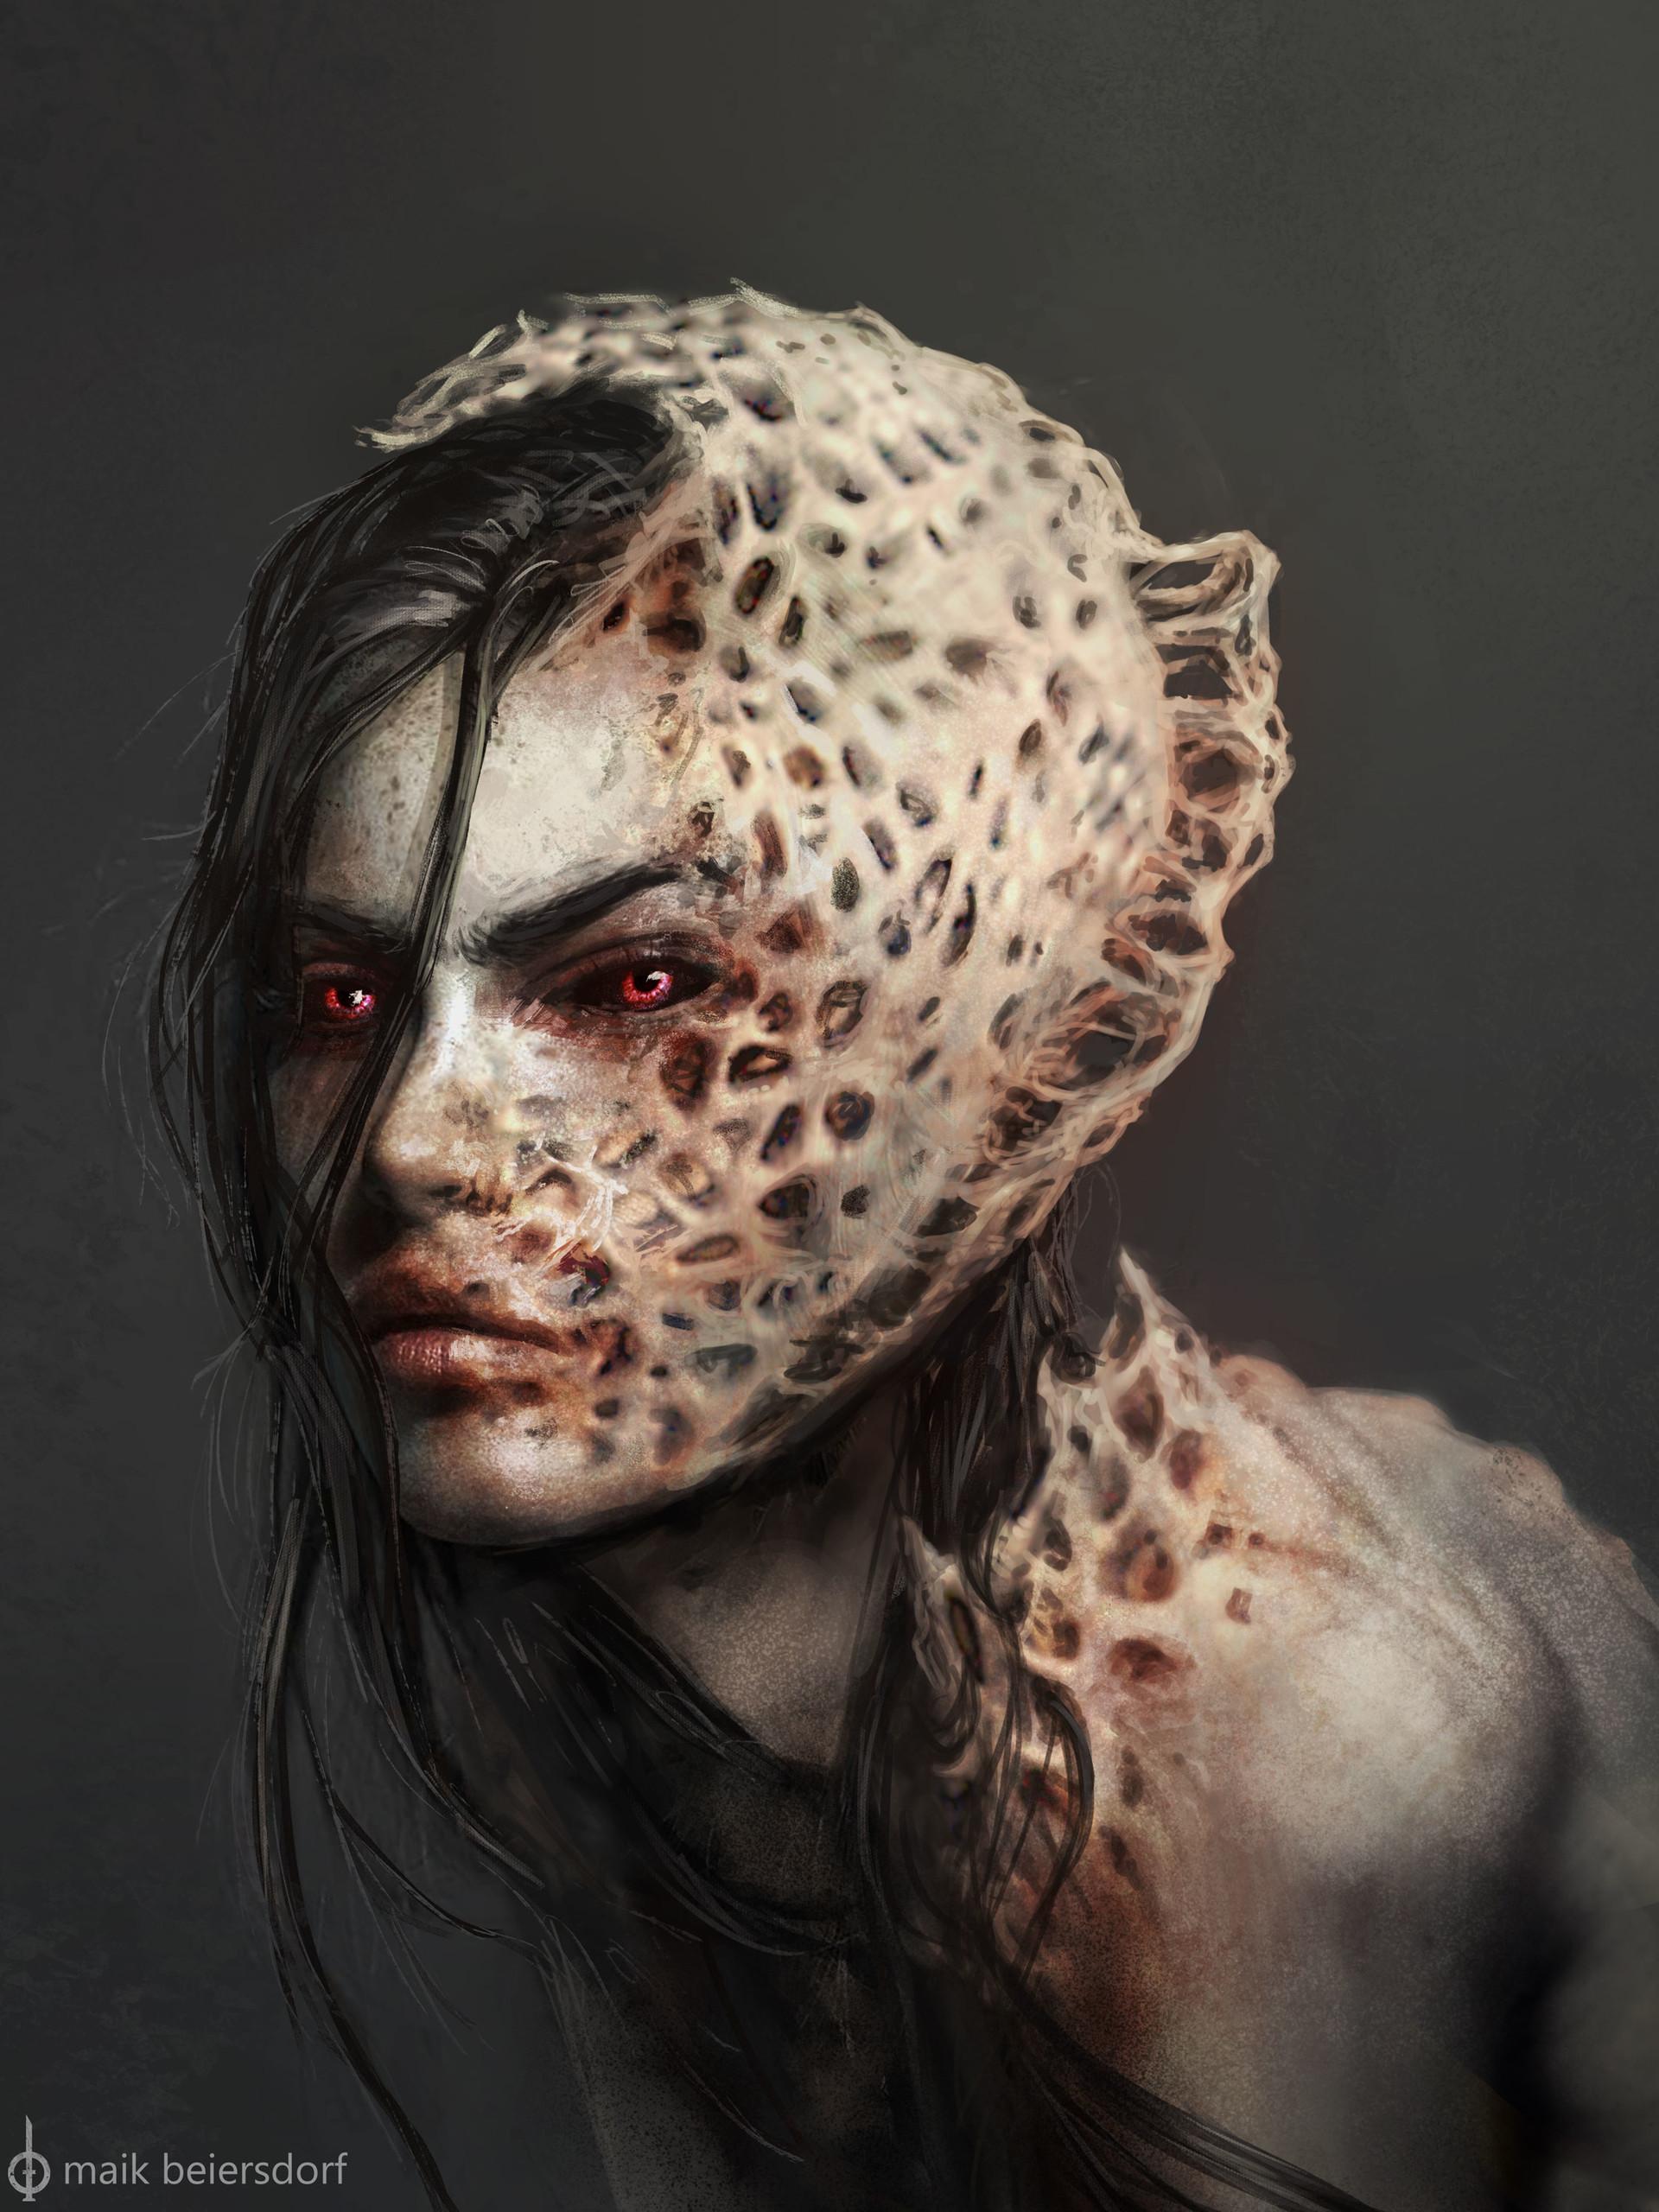 Maik beiersdorf basic infected woman portrait web